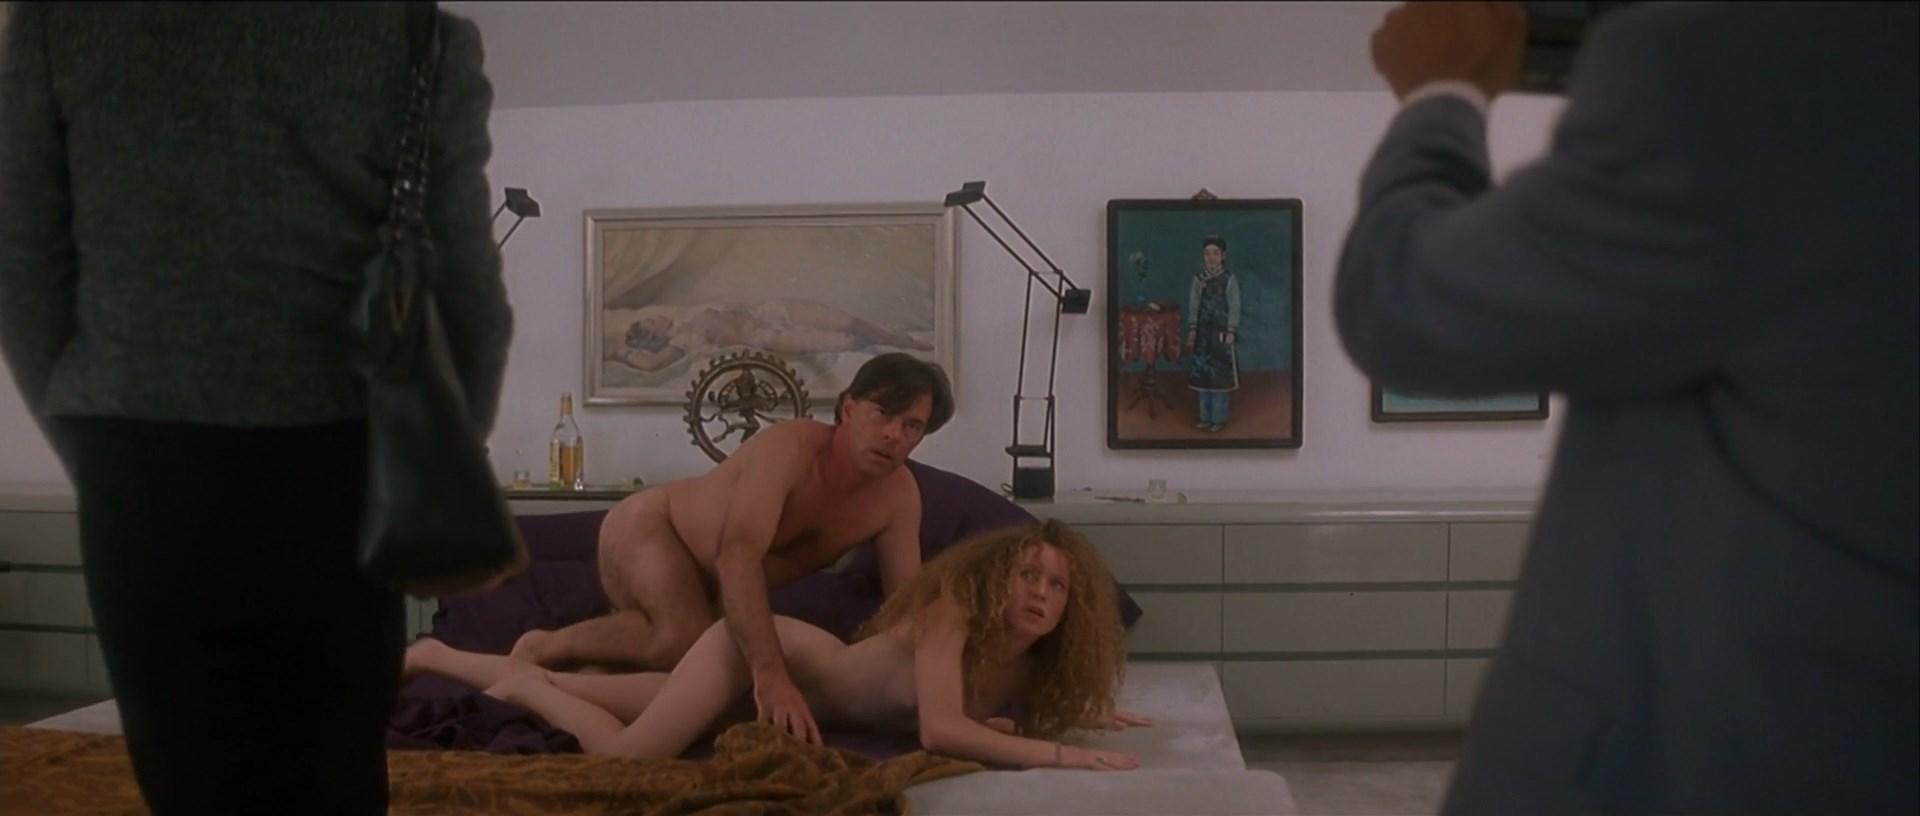 Bad company ellen barkin sex scene